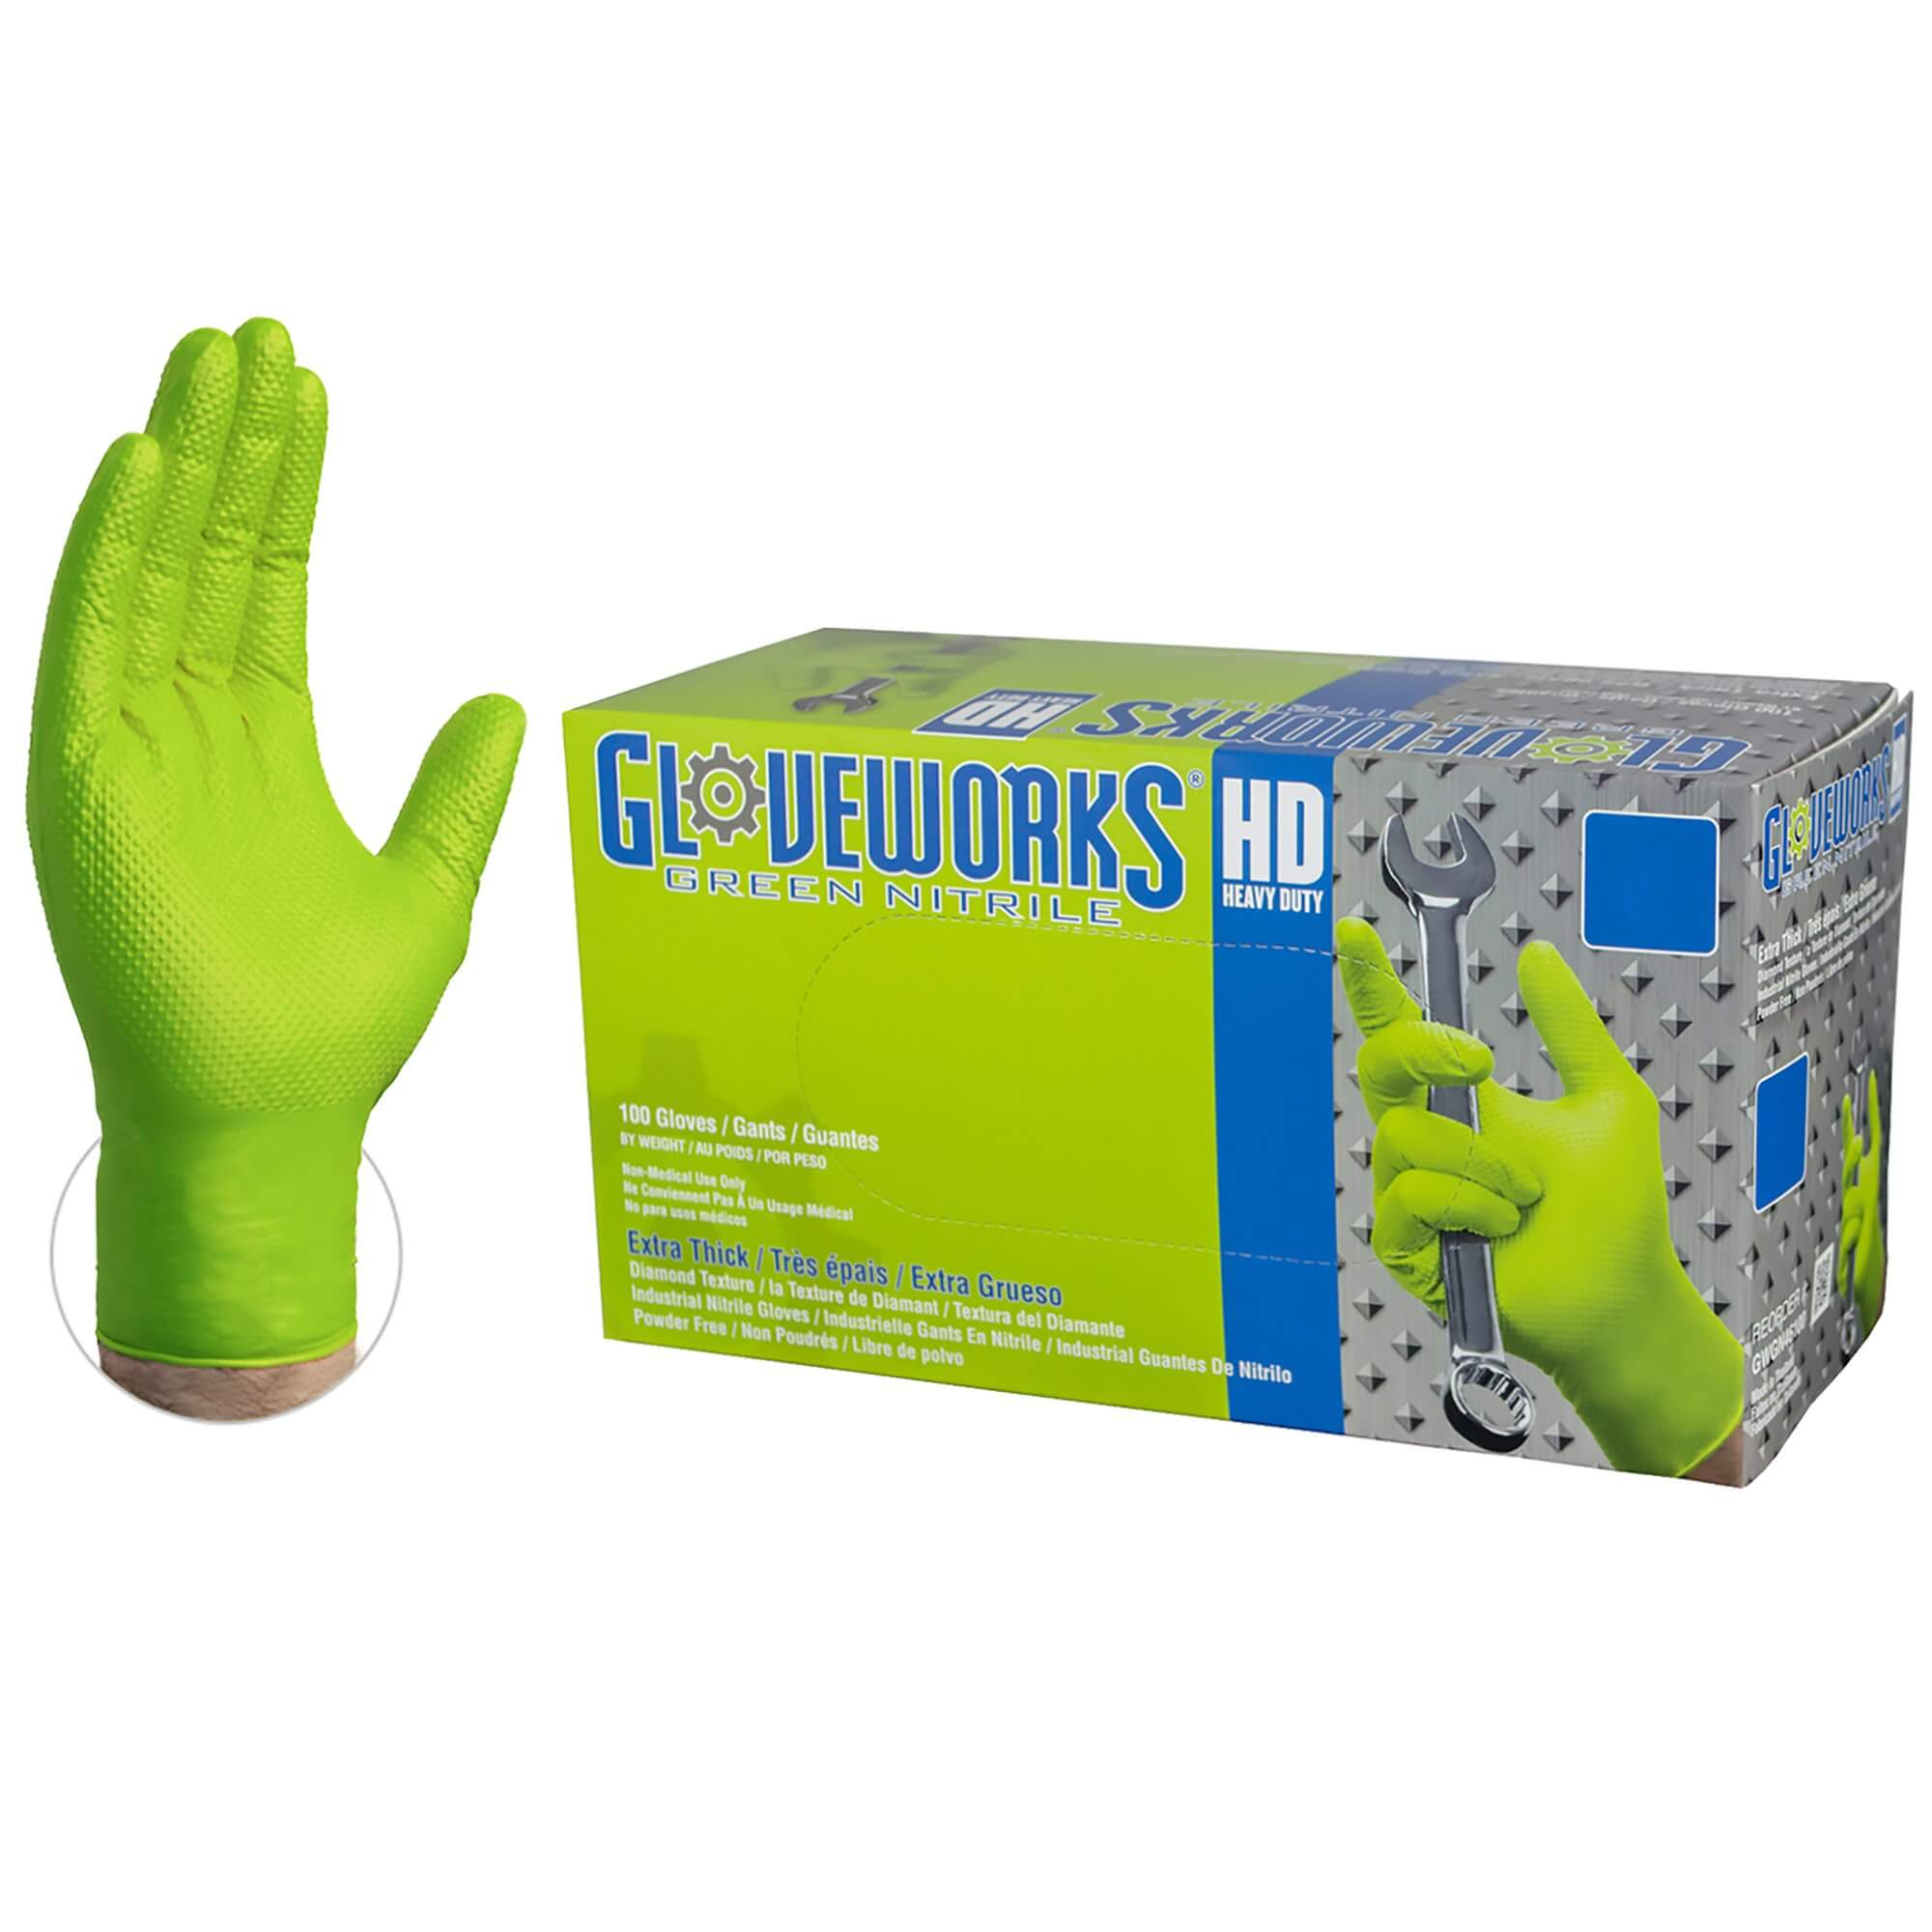 Gloveworks HD Green Nitrile Gloves